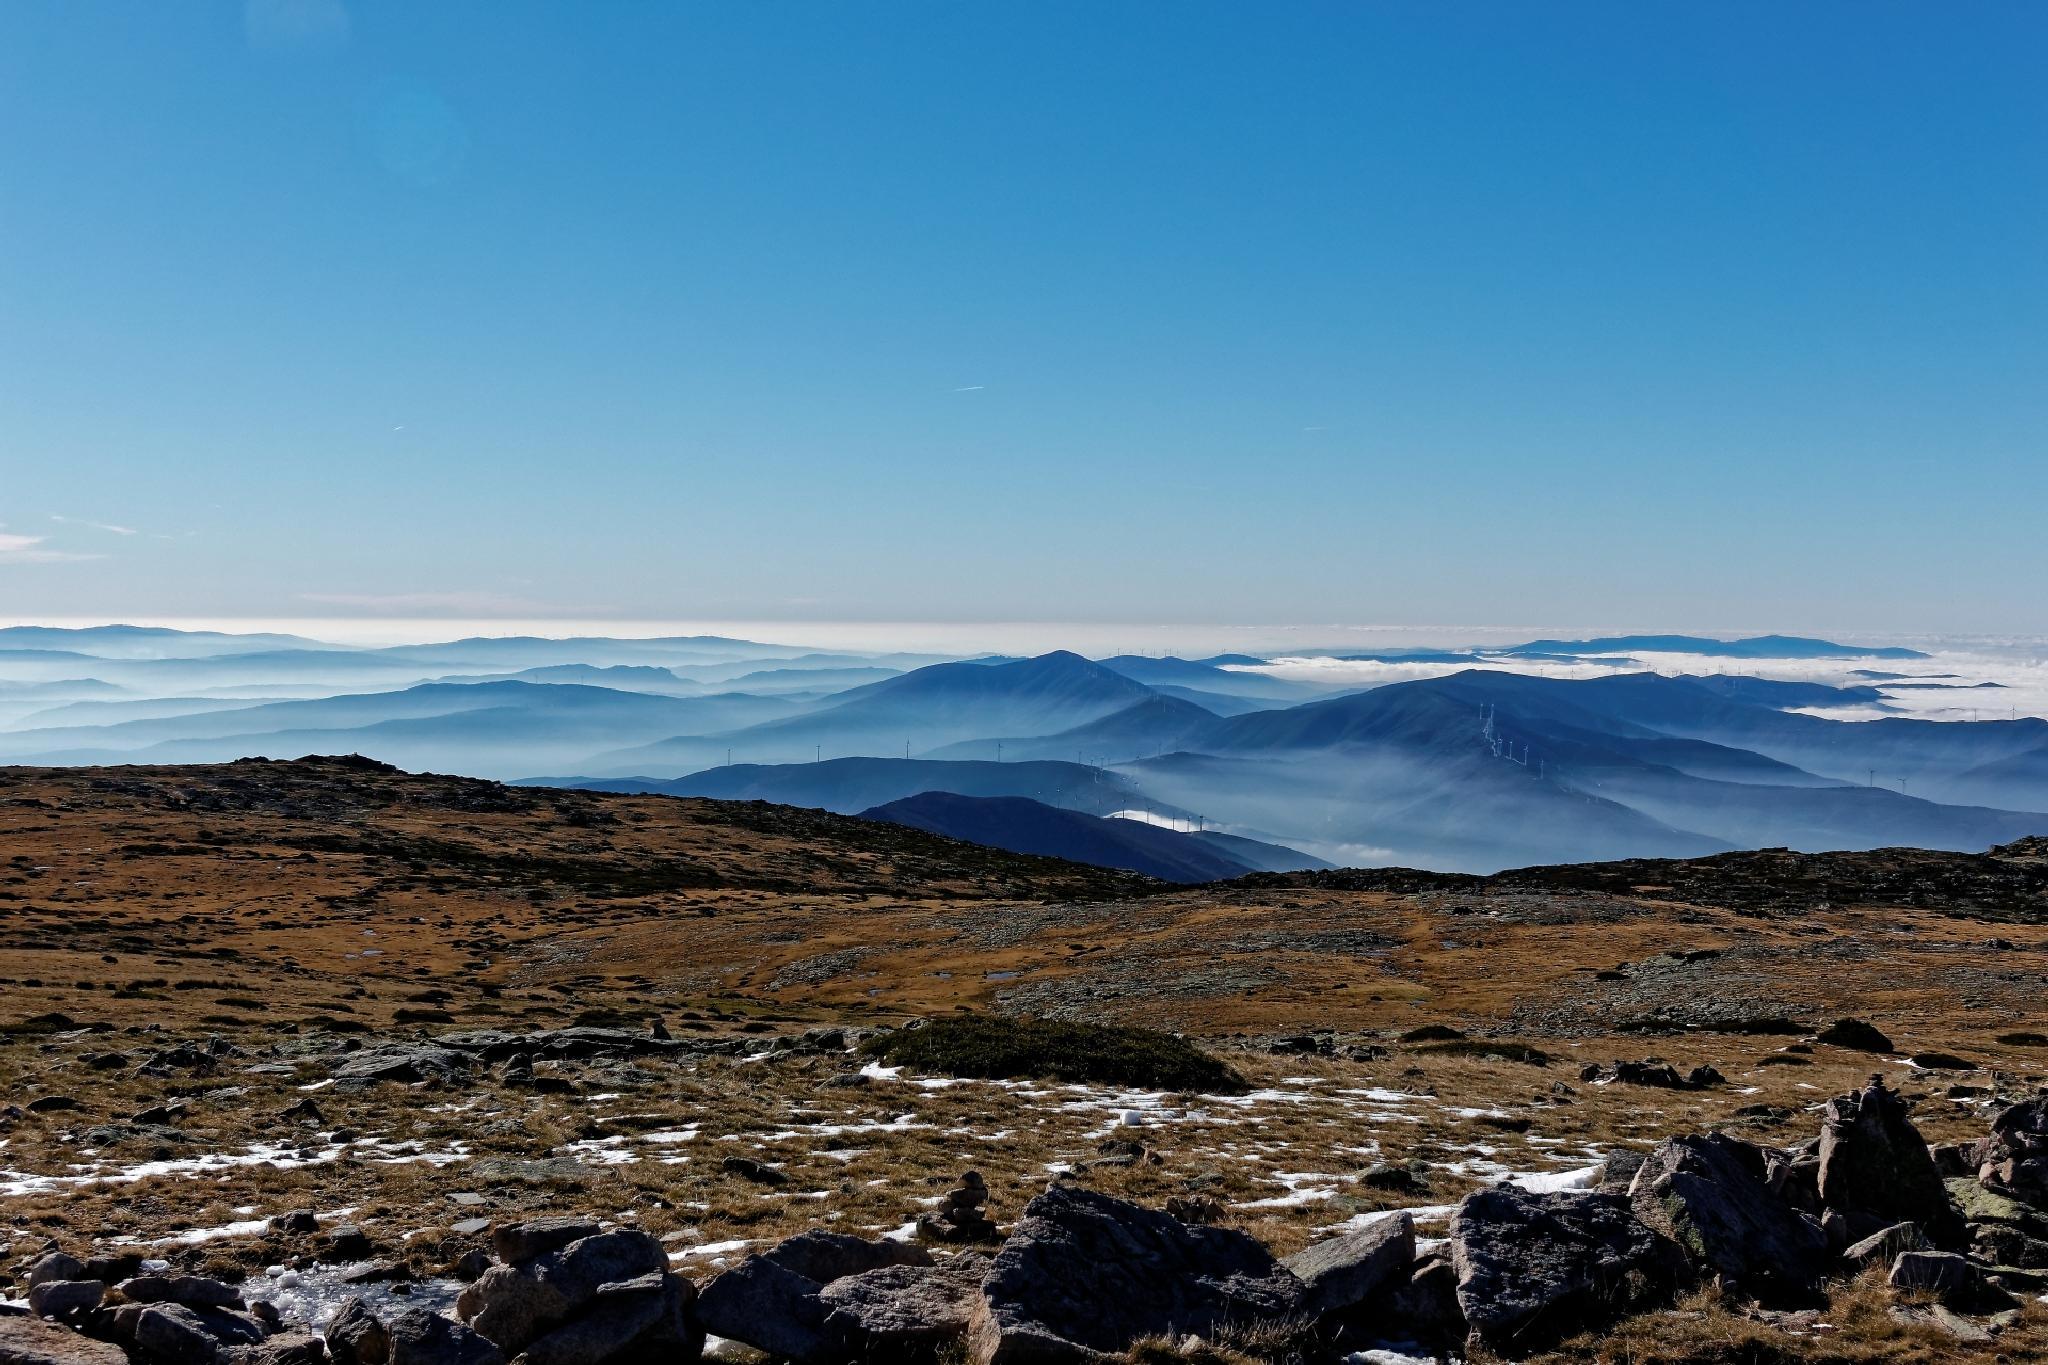 Serra da Estrela - Portugal by jose.downlord